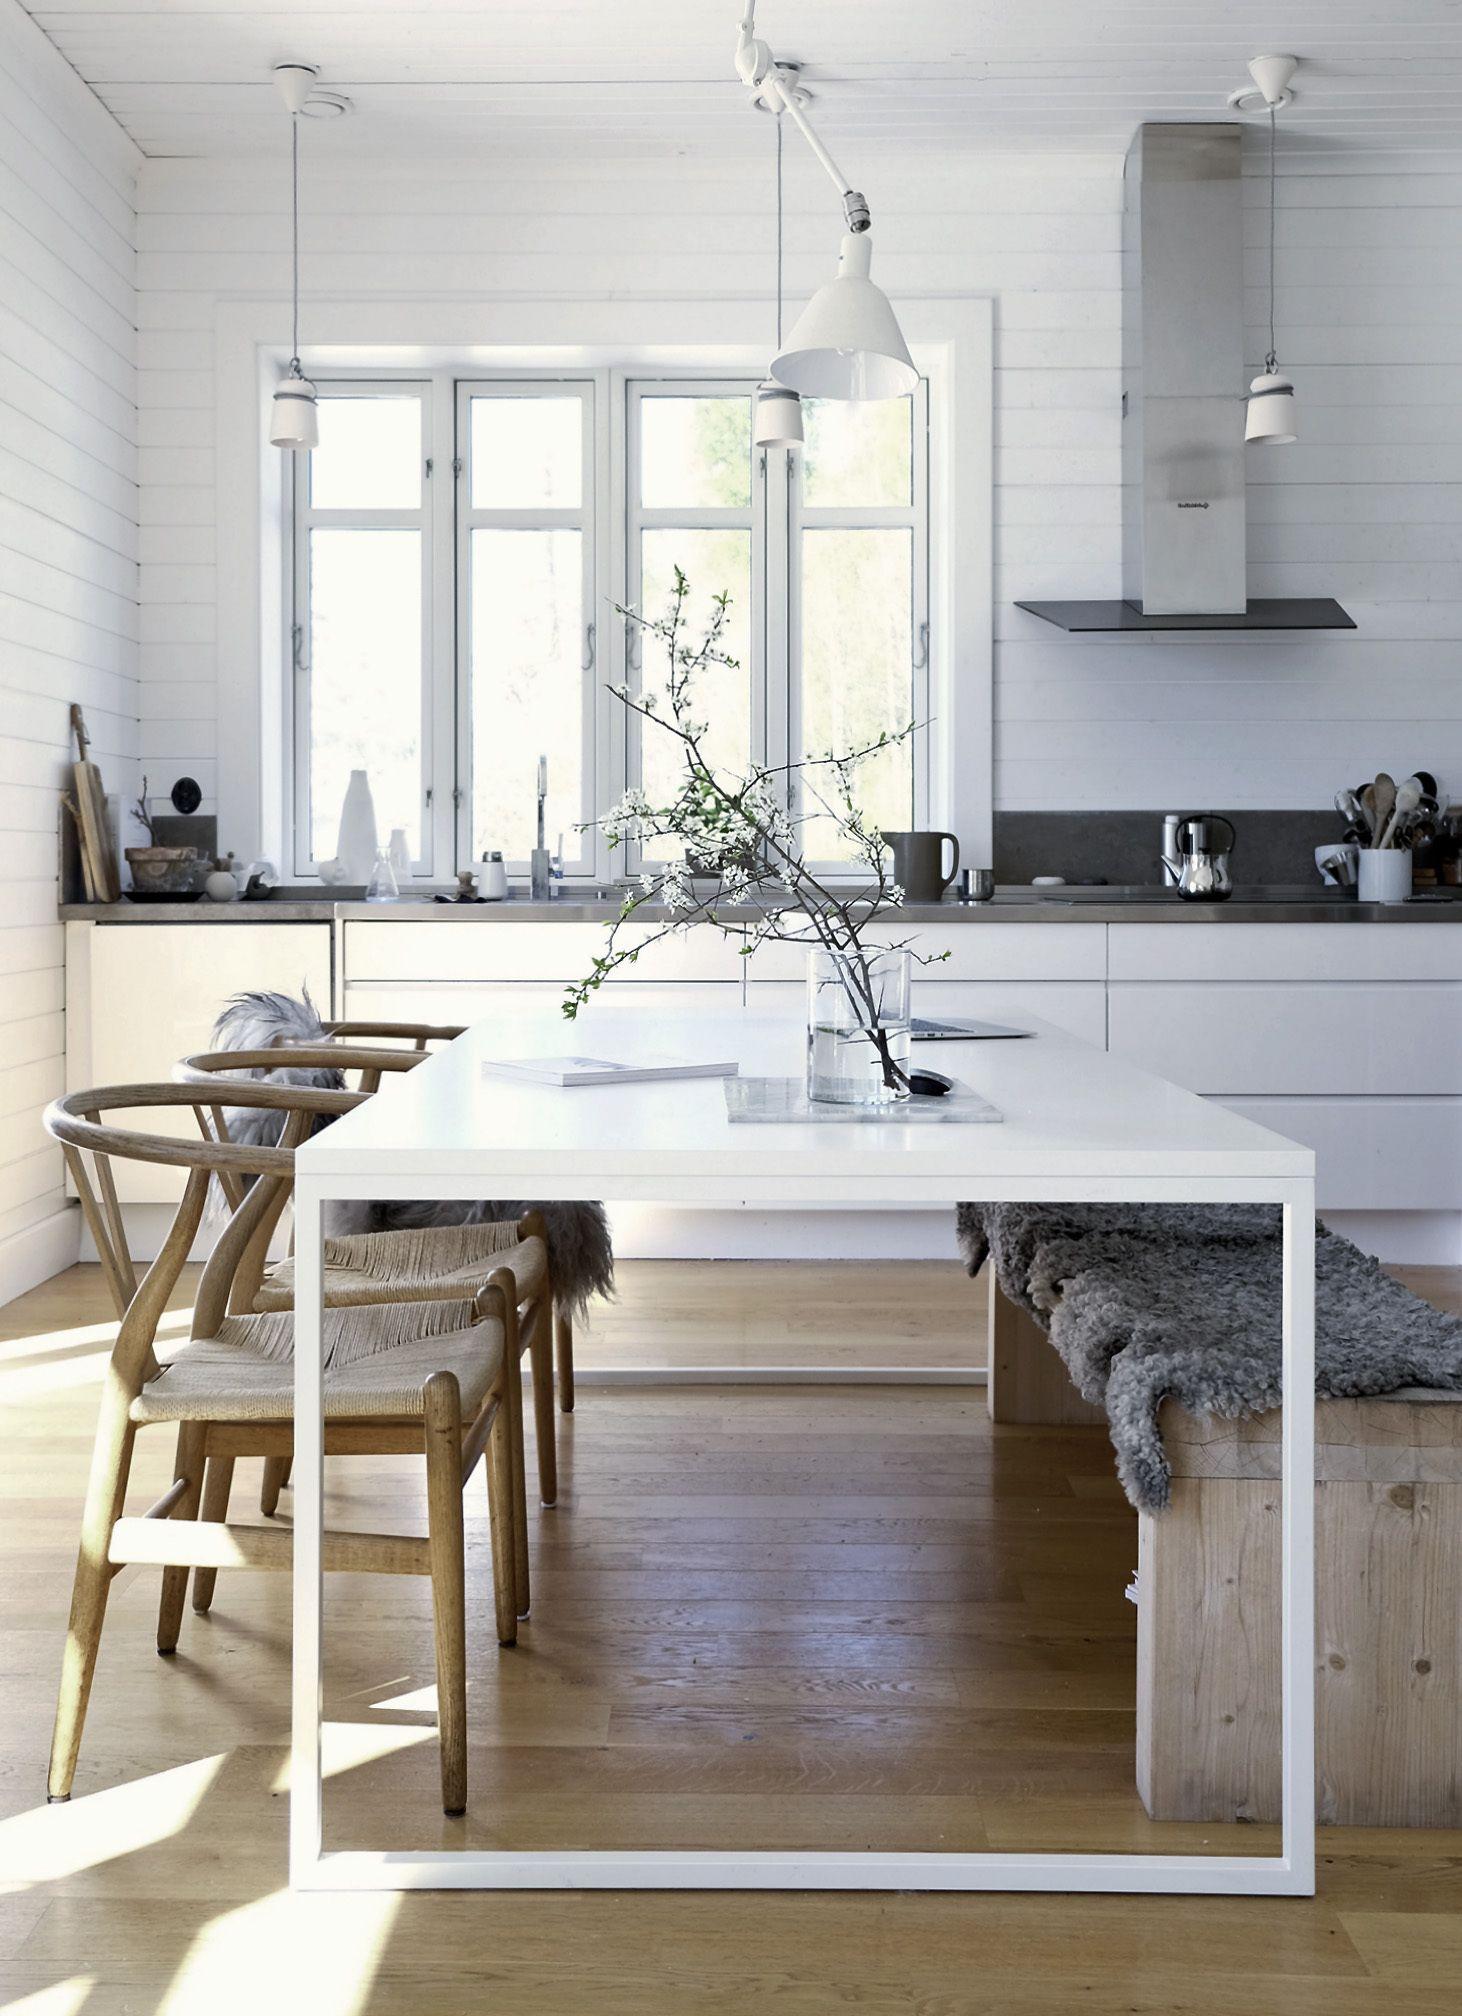 STILINSPIRATIONNewtable.jpg 1,462×2,016 pixels   Kitchen   Pinterest ...